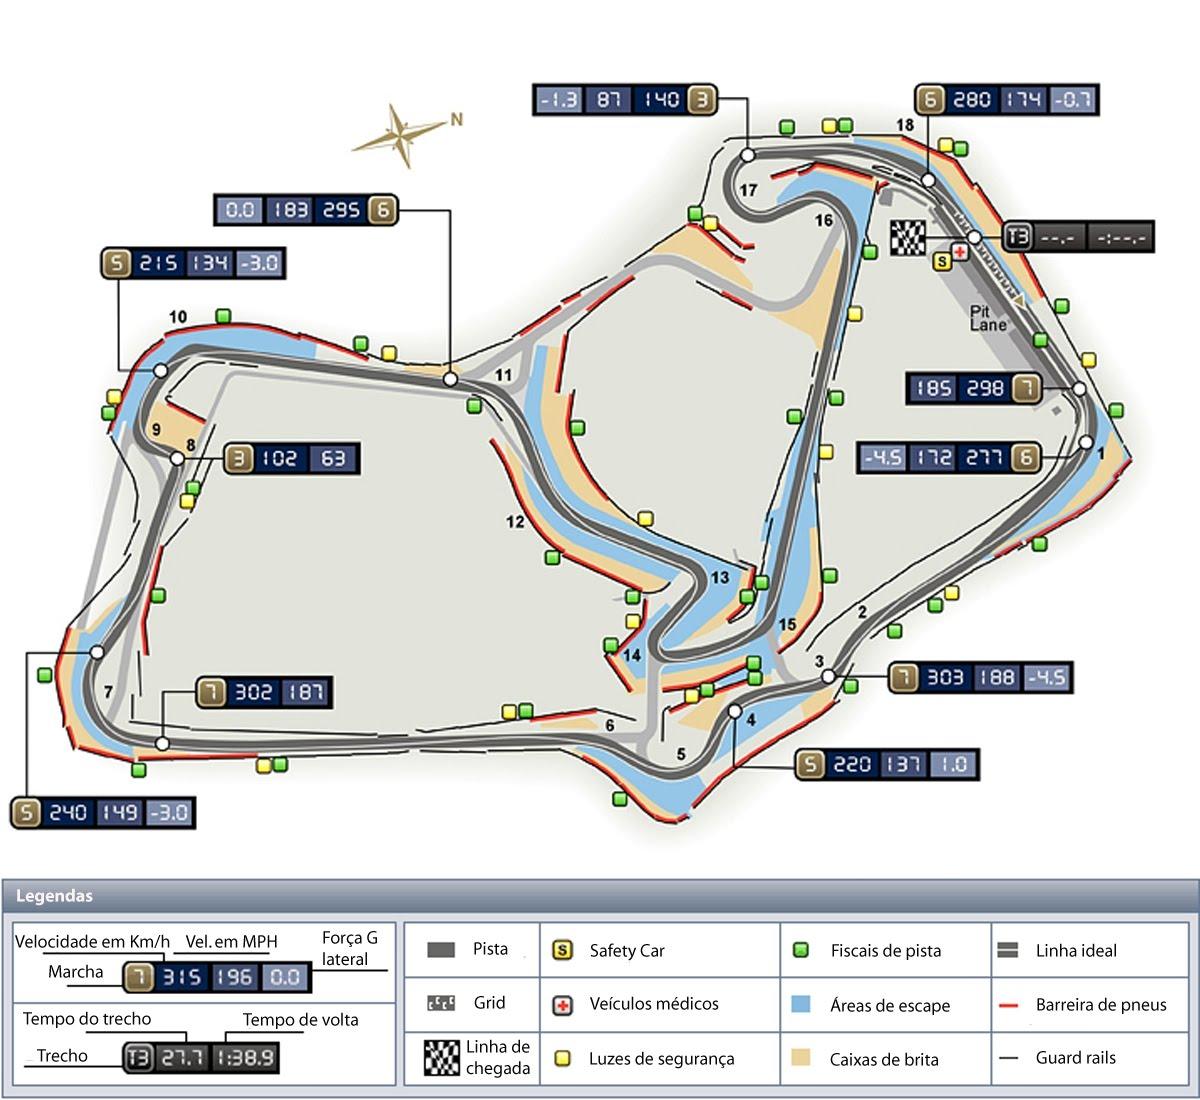 Circuito De Silverstone : Bit bytes do esporte: fórmula 1: análise técnica de silverstone